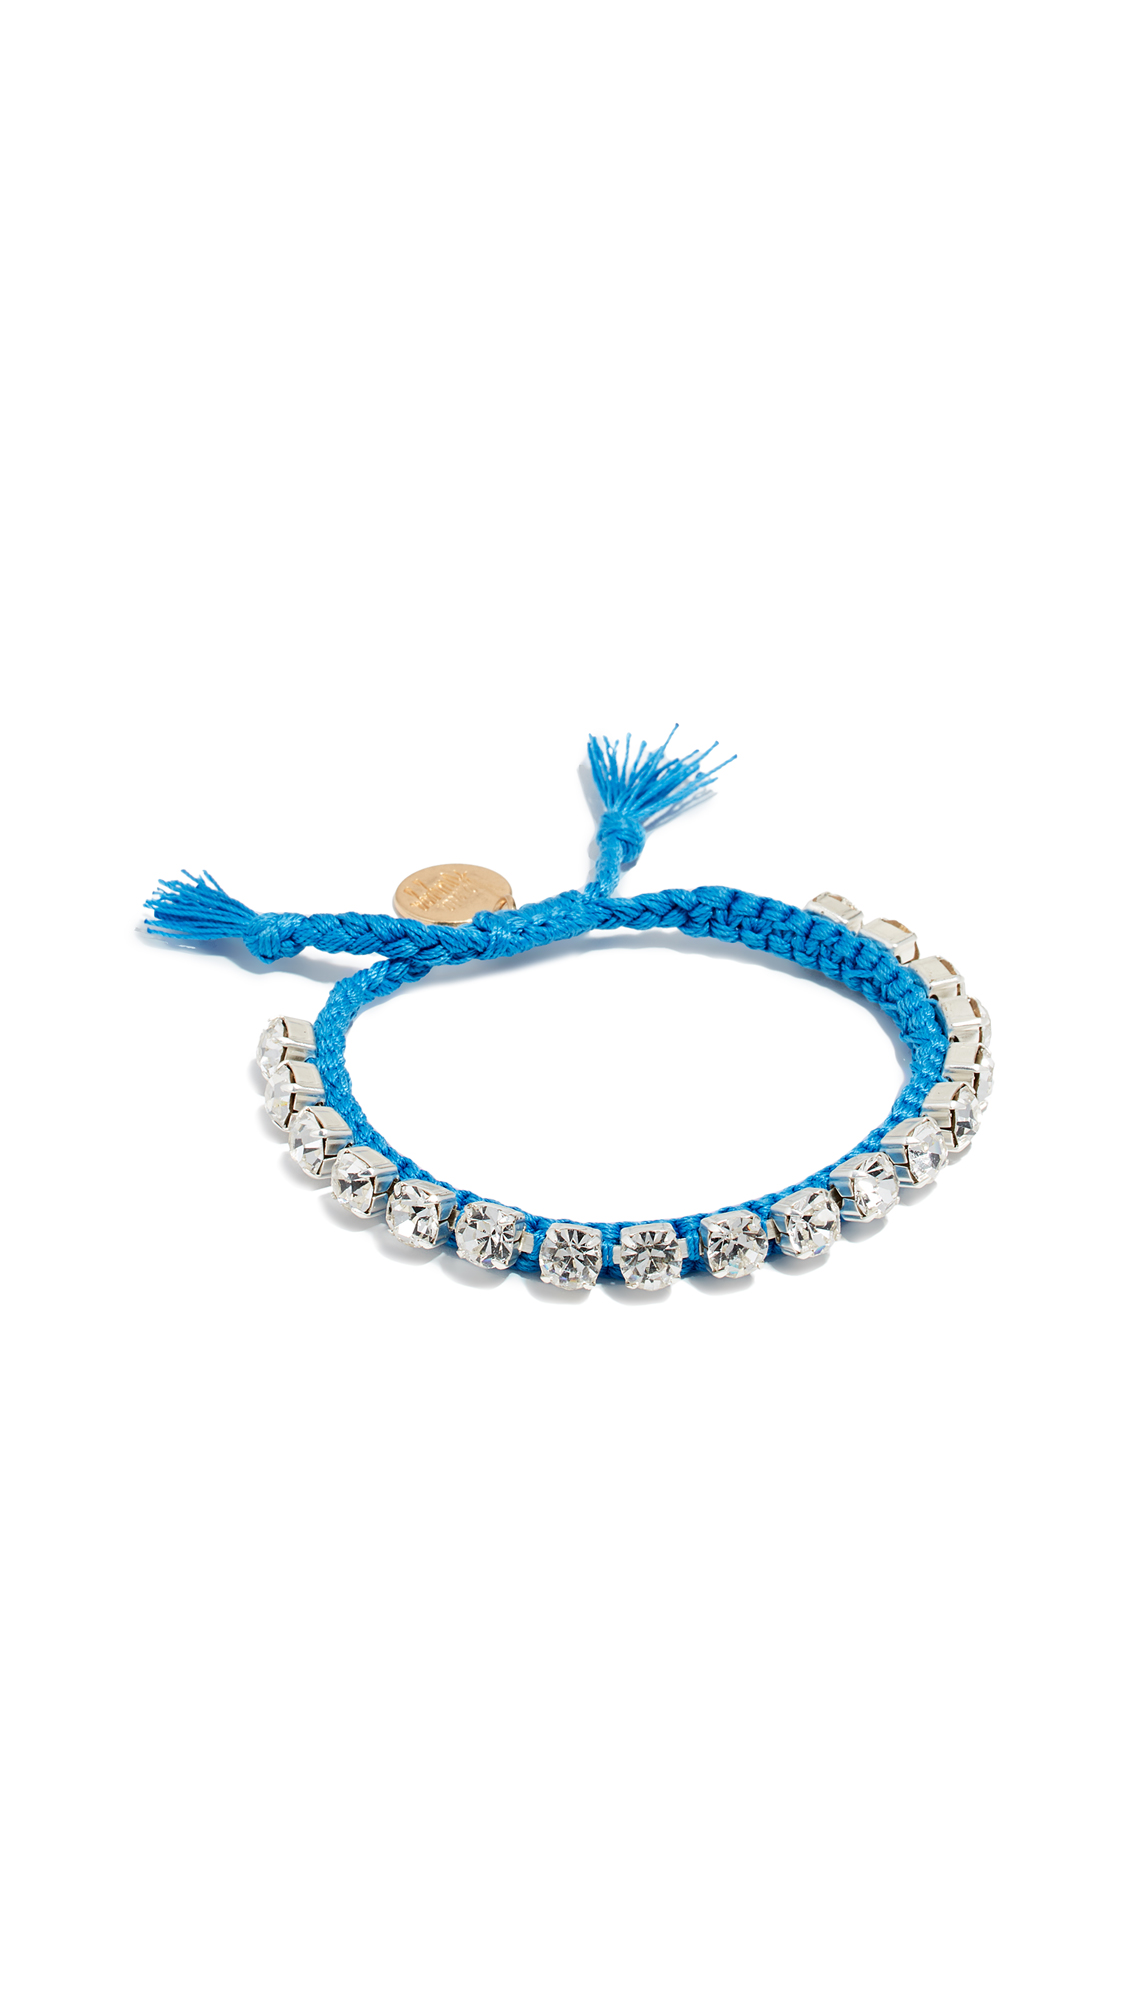 VENESSA ARIZAGA Sweet Shine Bracelet in Blue